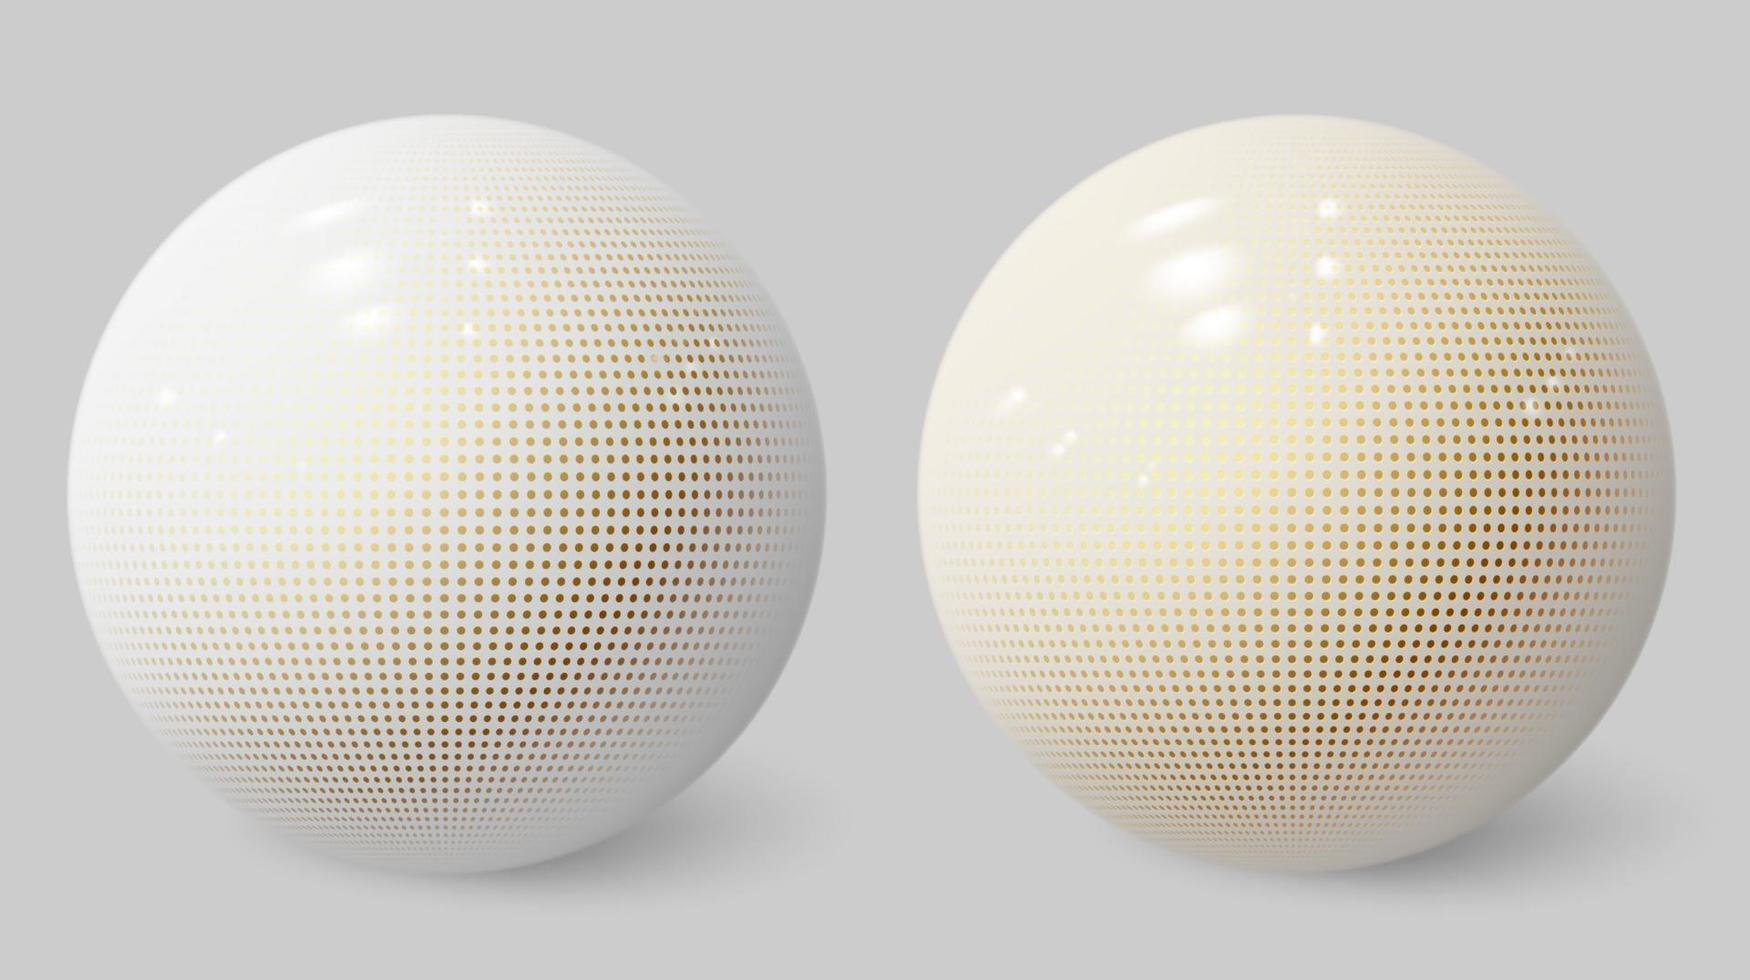 esfera 3d realista. bolha branca. bola texturizada. vetor